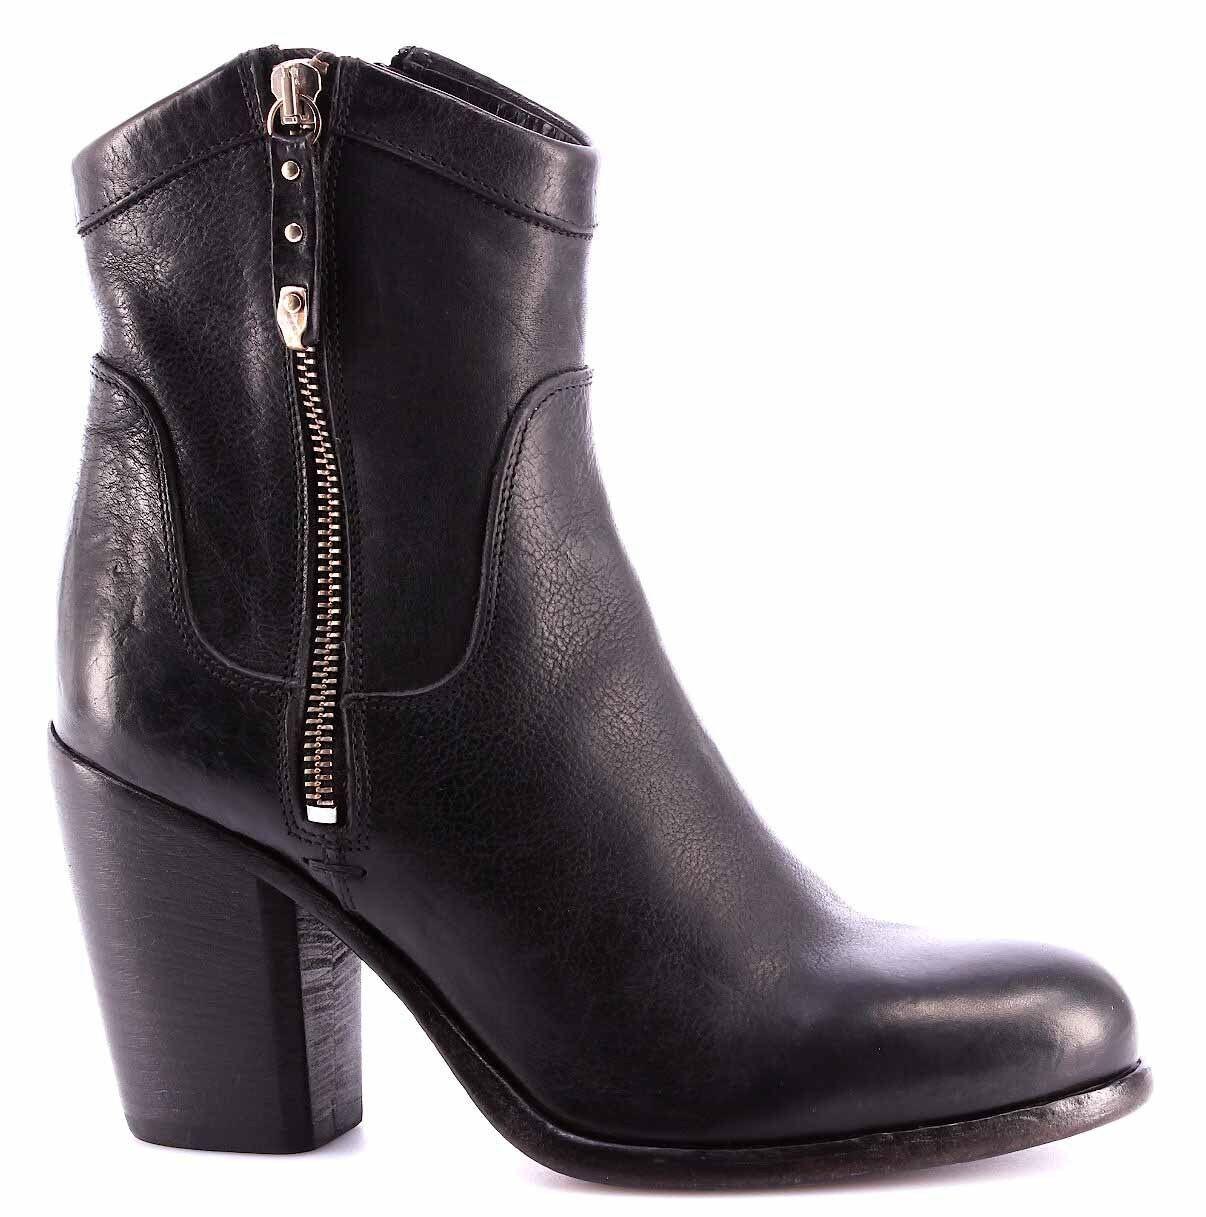 MOMA Cusna Scarpe Stivaletto Donna Ankle Boot 91503-4A Cusna MOMA Nero Pelle Vintage Italy 665da4